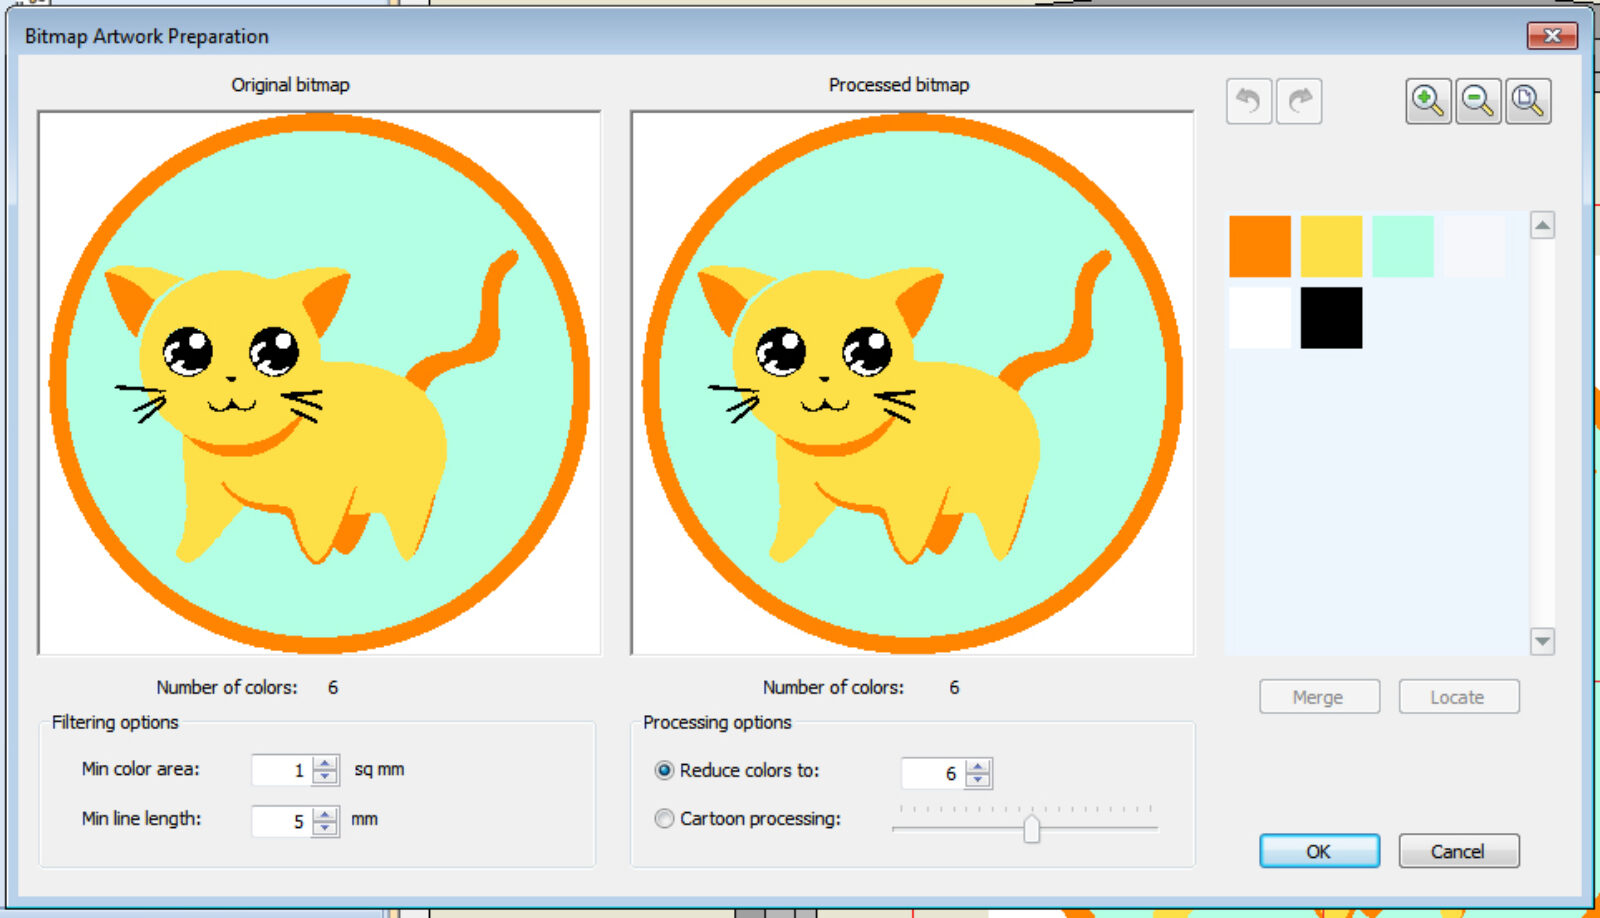 Bitmap Artwork Preparation